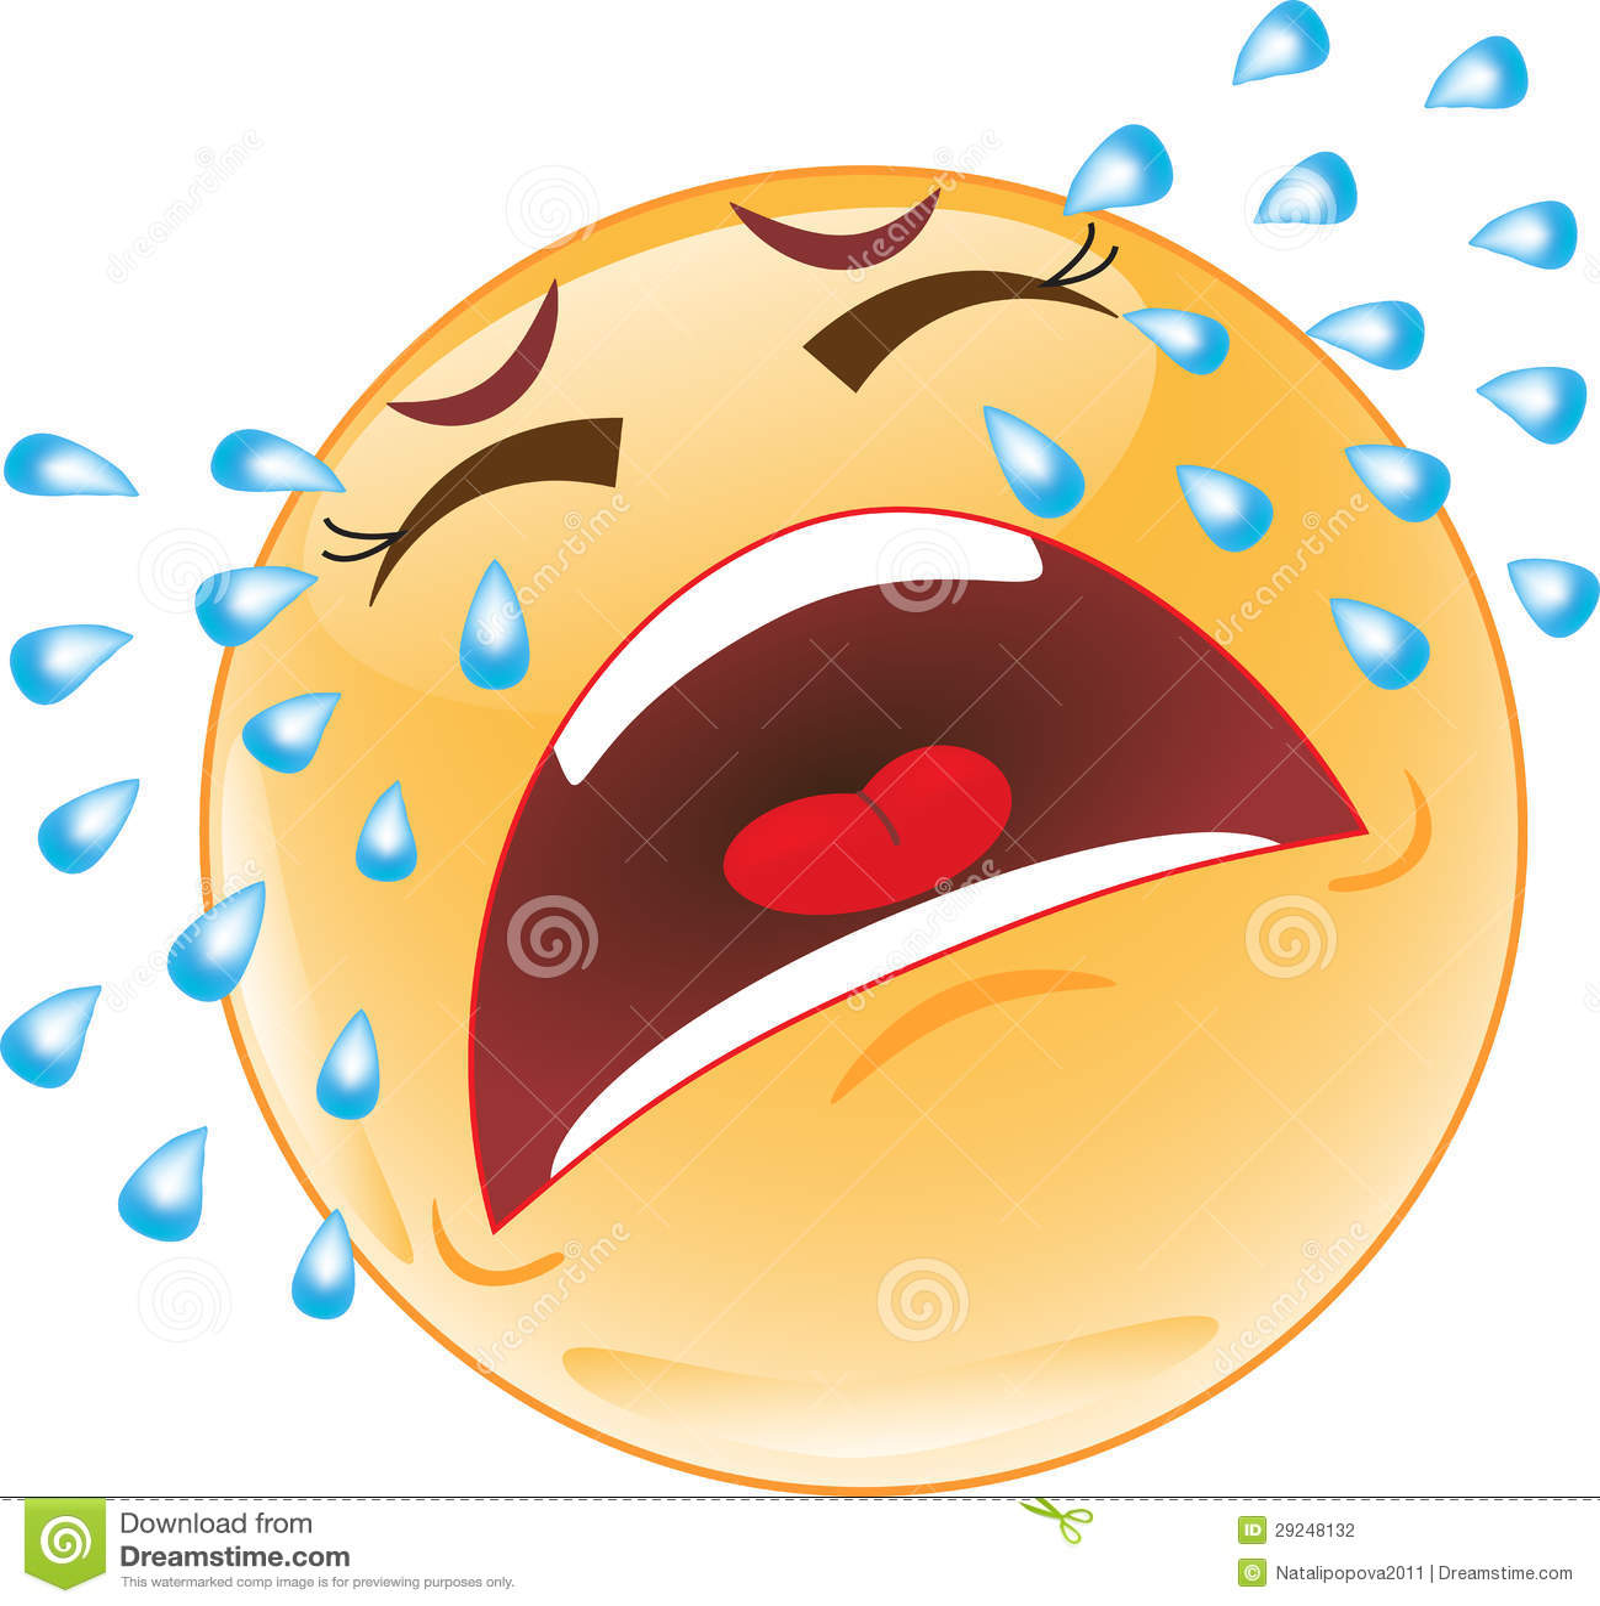 Crying Smiley Illustration 29248132 Megapixl